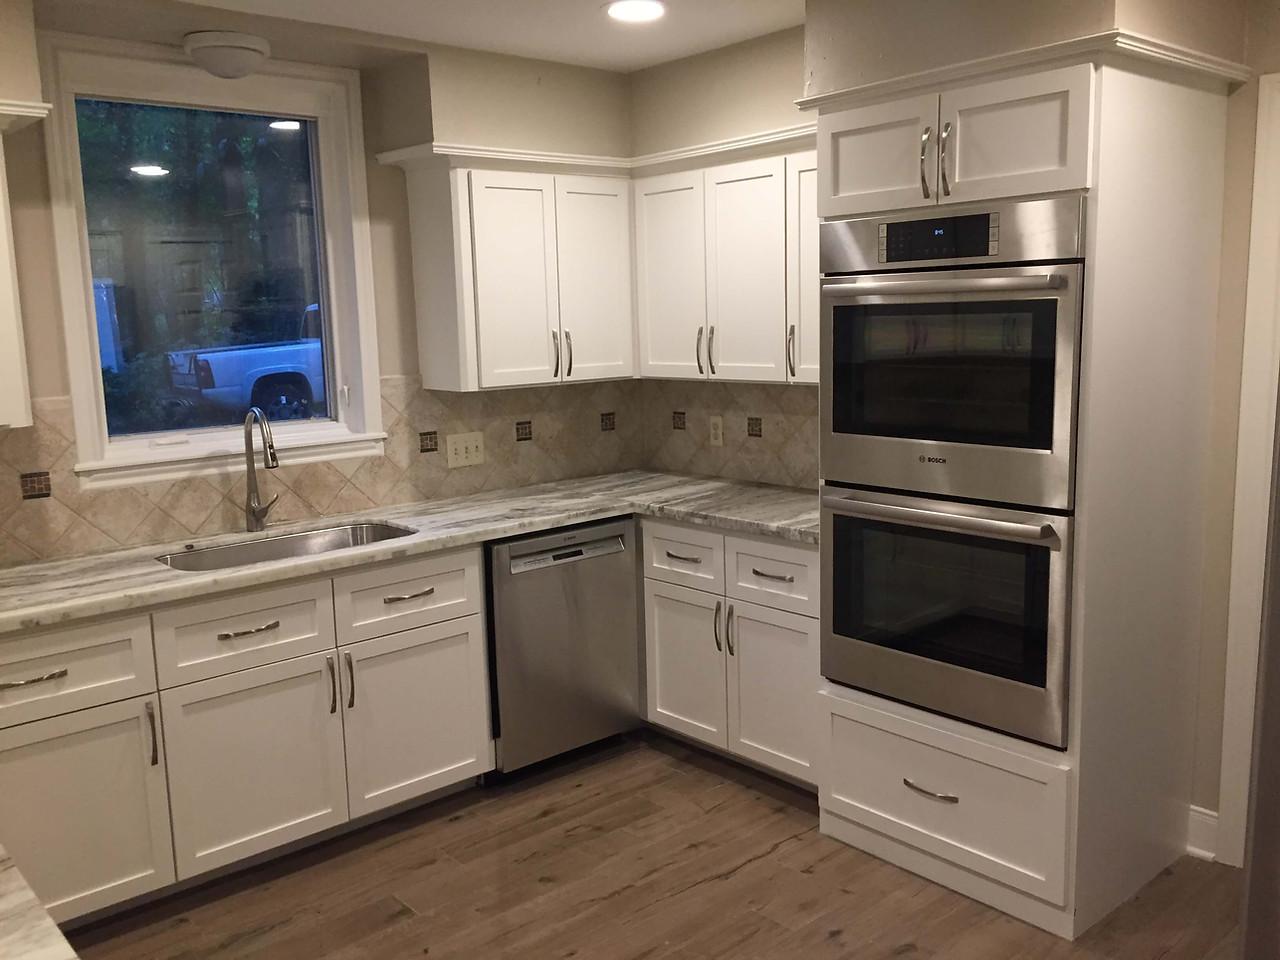 white decor kitchen with steel appliance installations